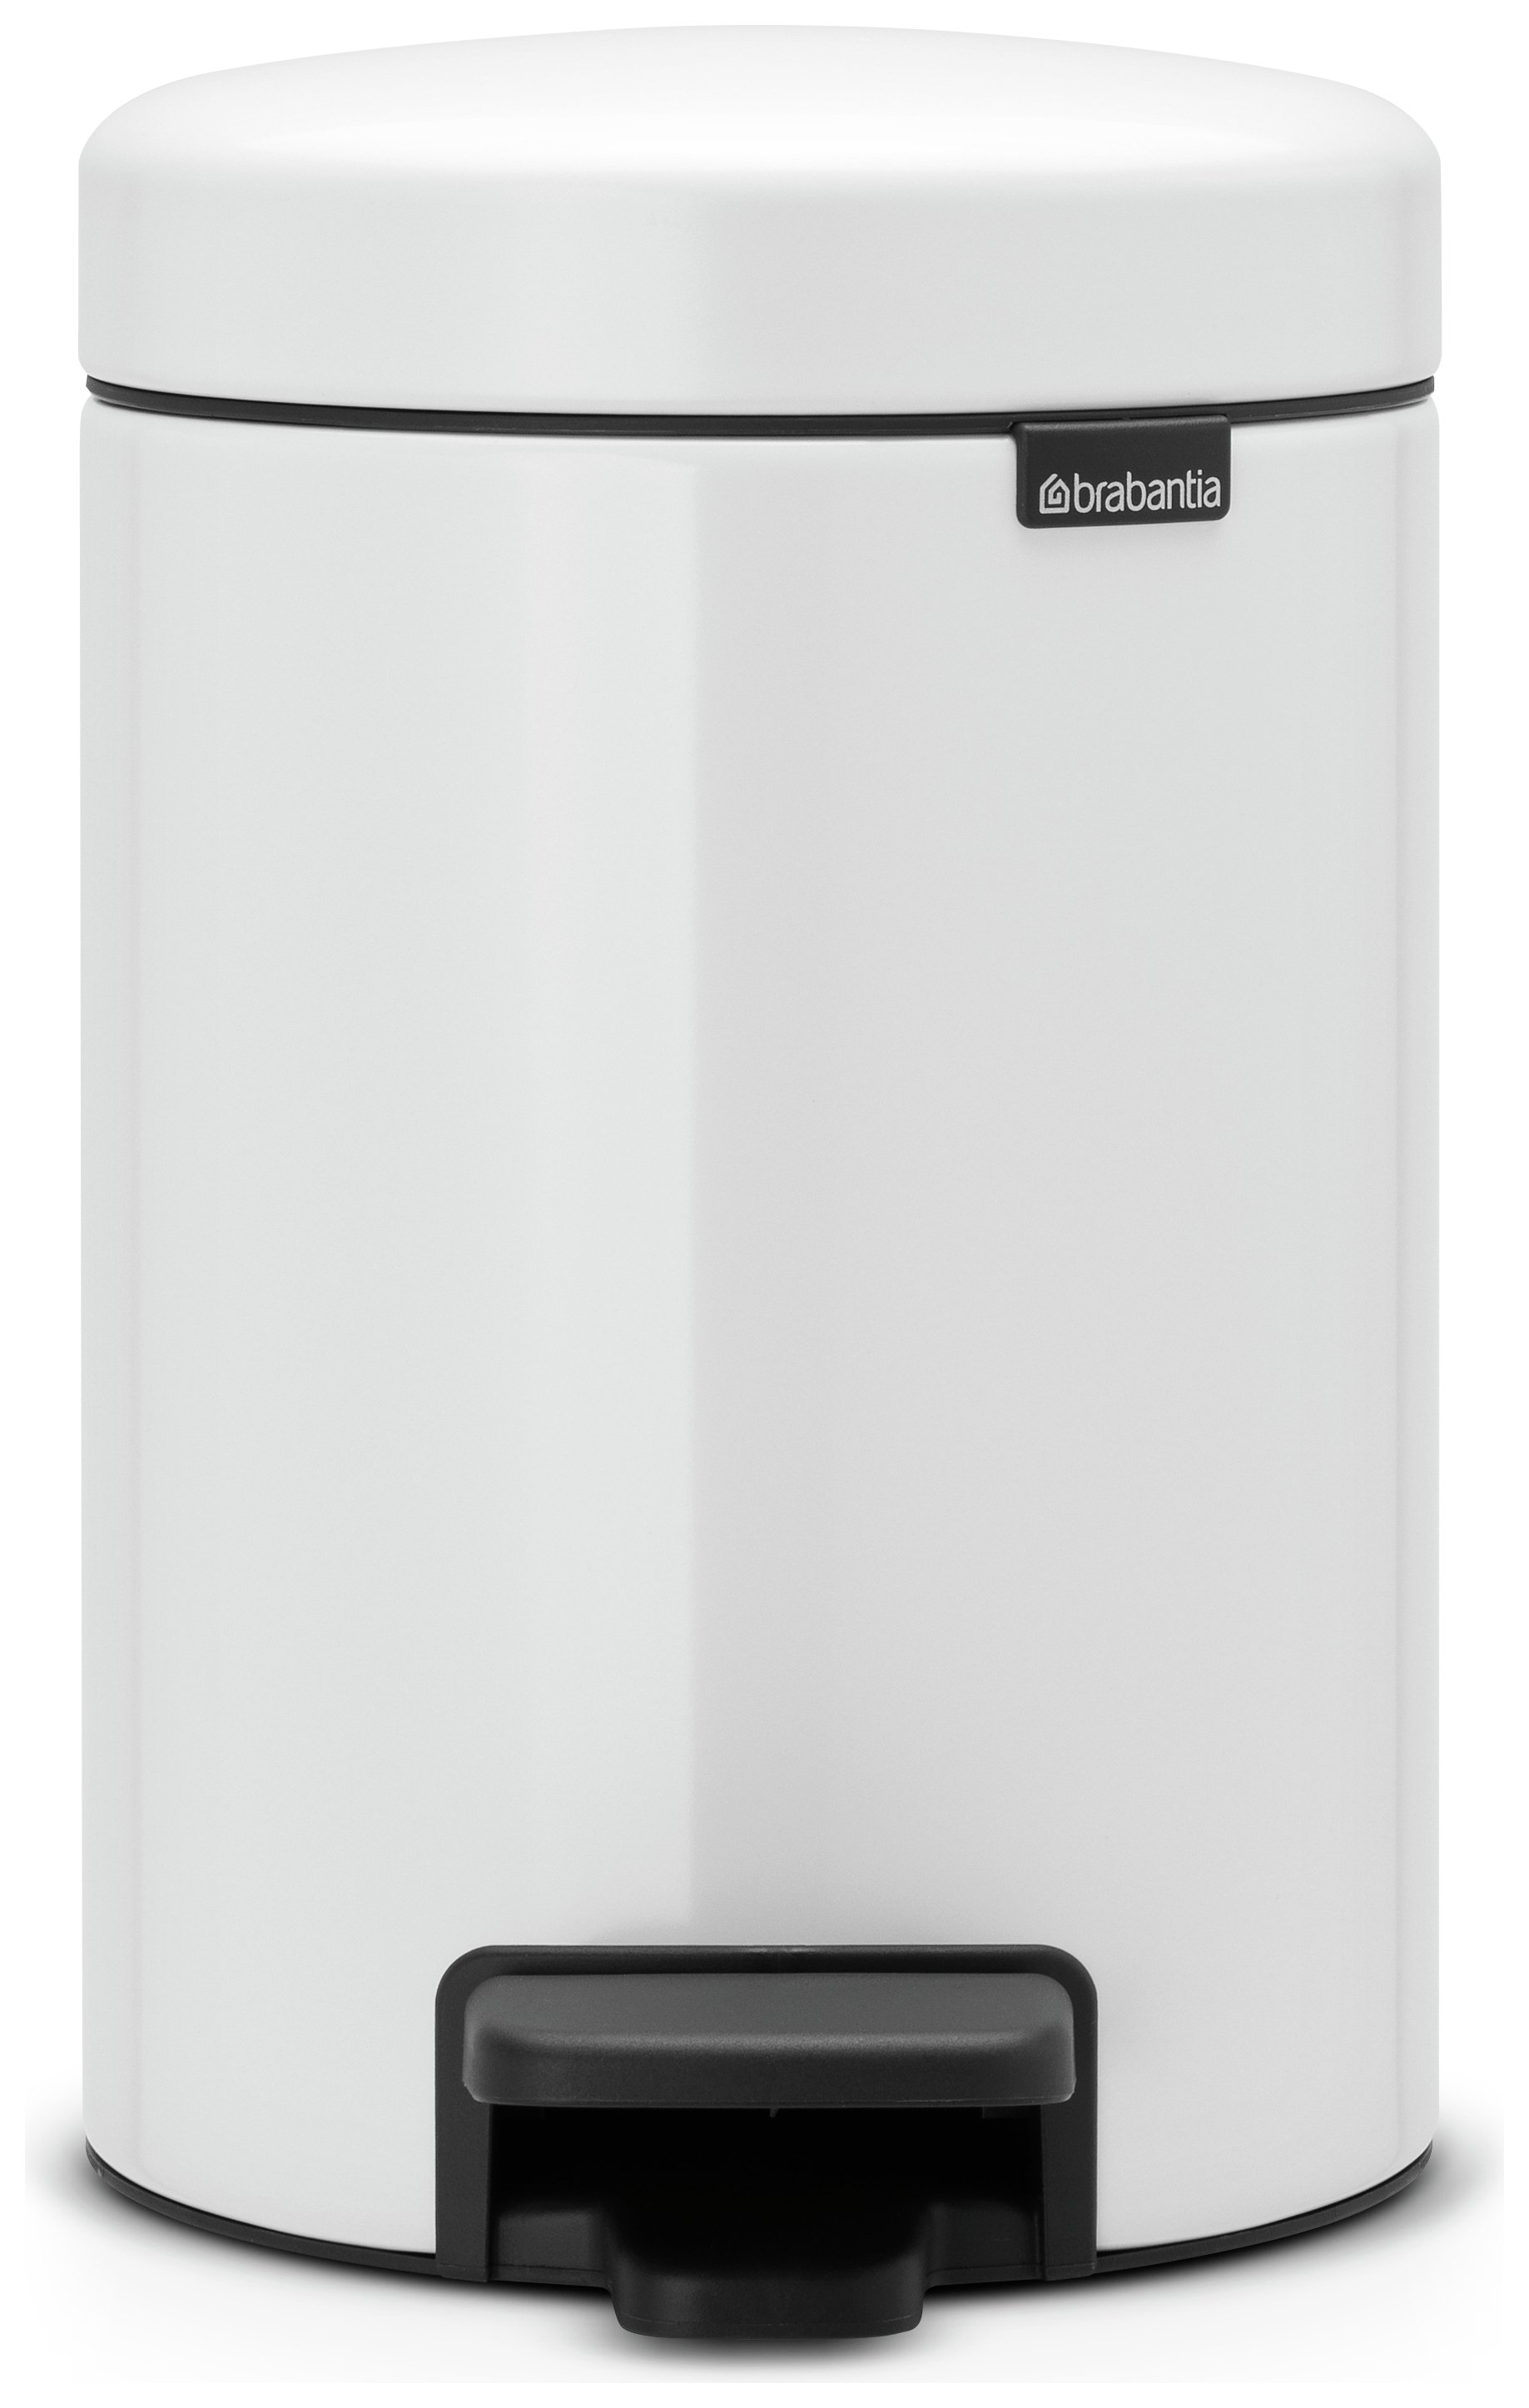 brabantia-3-litre-newicon-pedal-bin-white